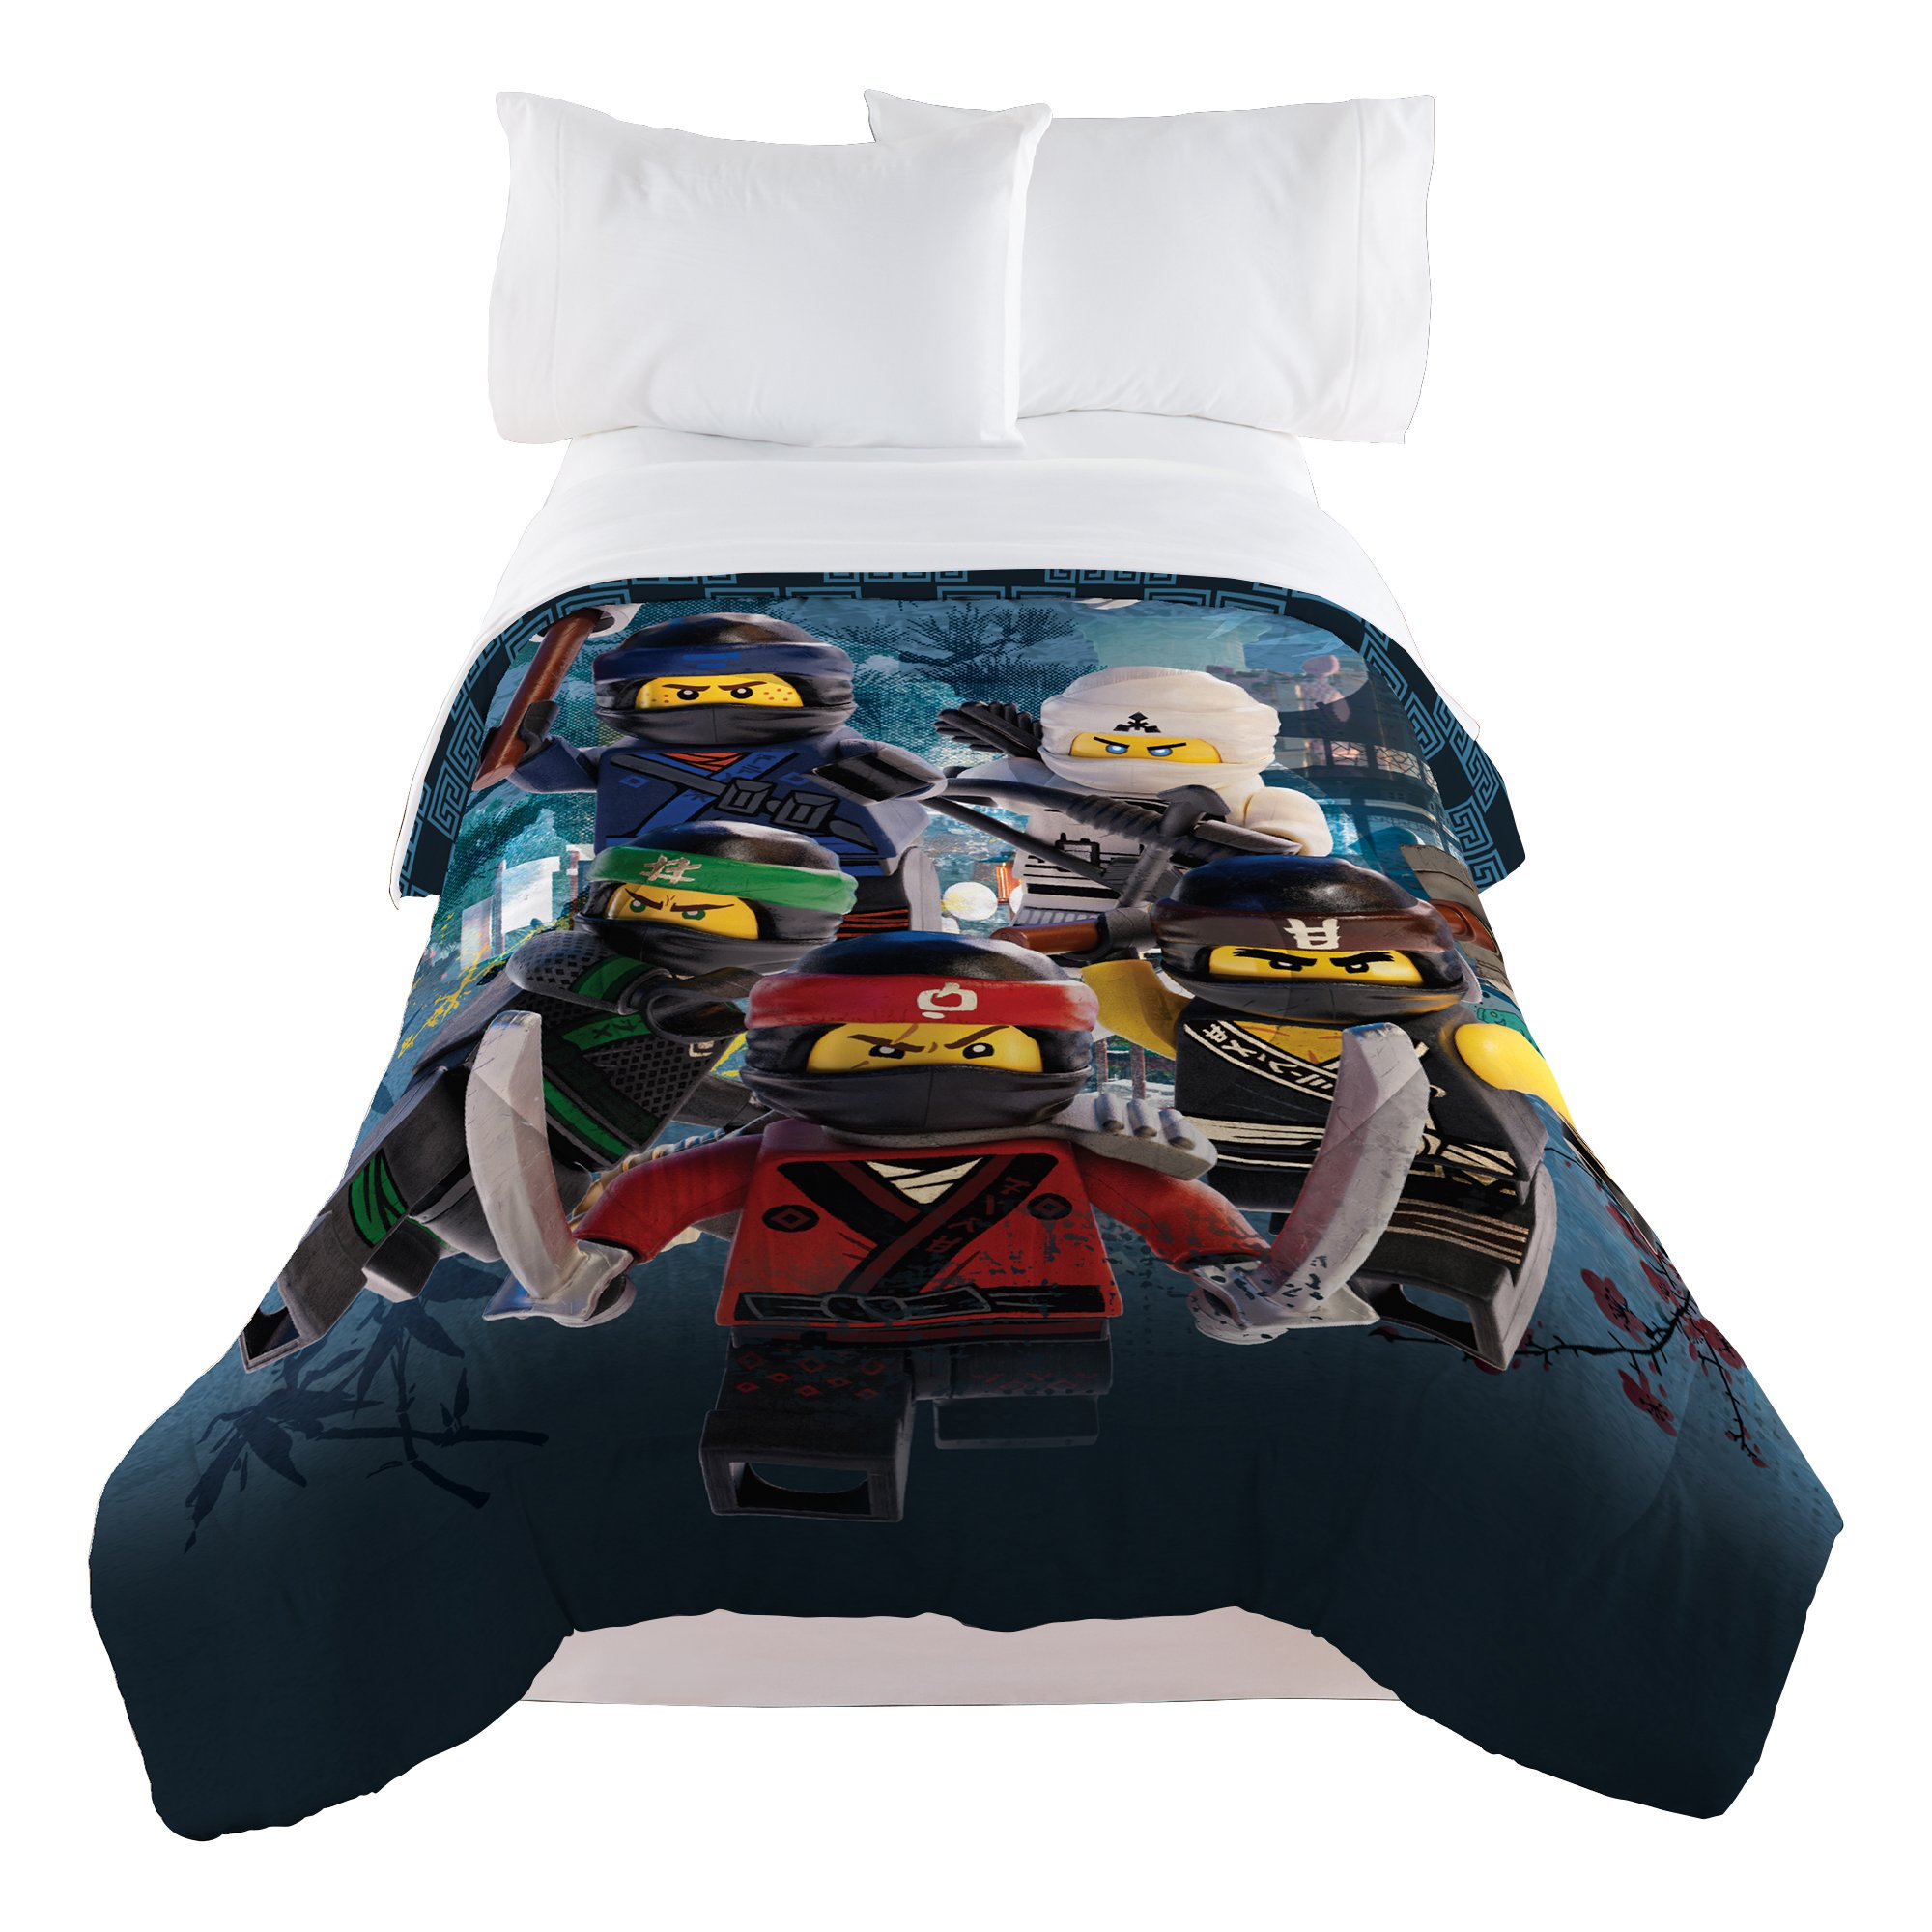 LEGO Ninjago Warriors Comforter, Twin/Full